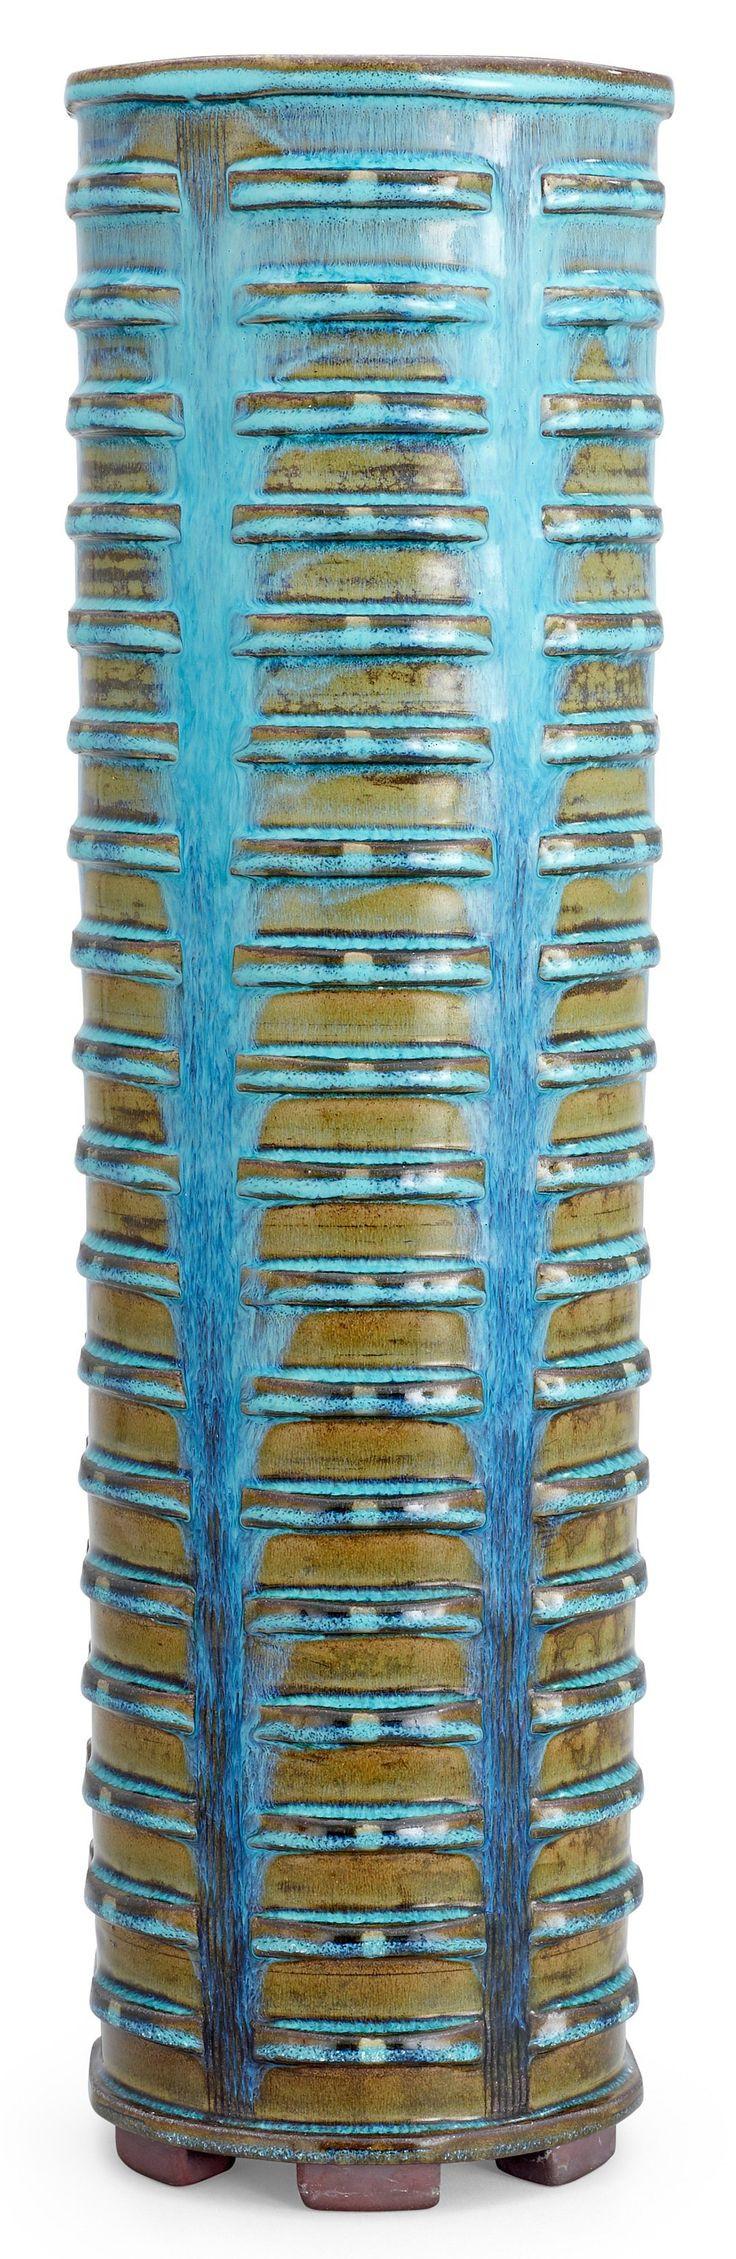 teal ceramic vase of 496 best ceramics two images on pinterest ceramics ceramic art throughout wilhelm ka¥ge swedish1889 1960 gustavsberg studio farsta glaze a· pottery claypottery vaseceramic